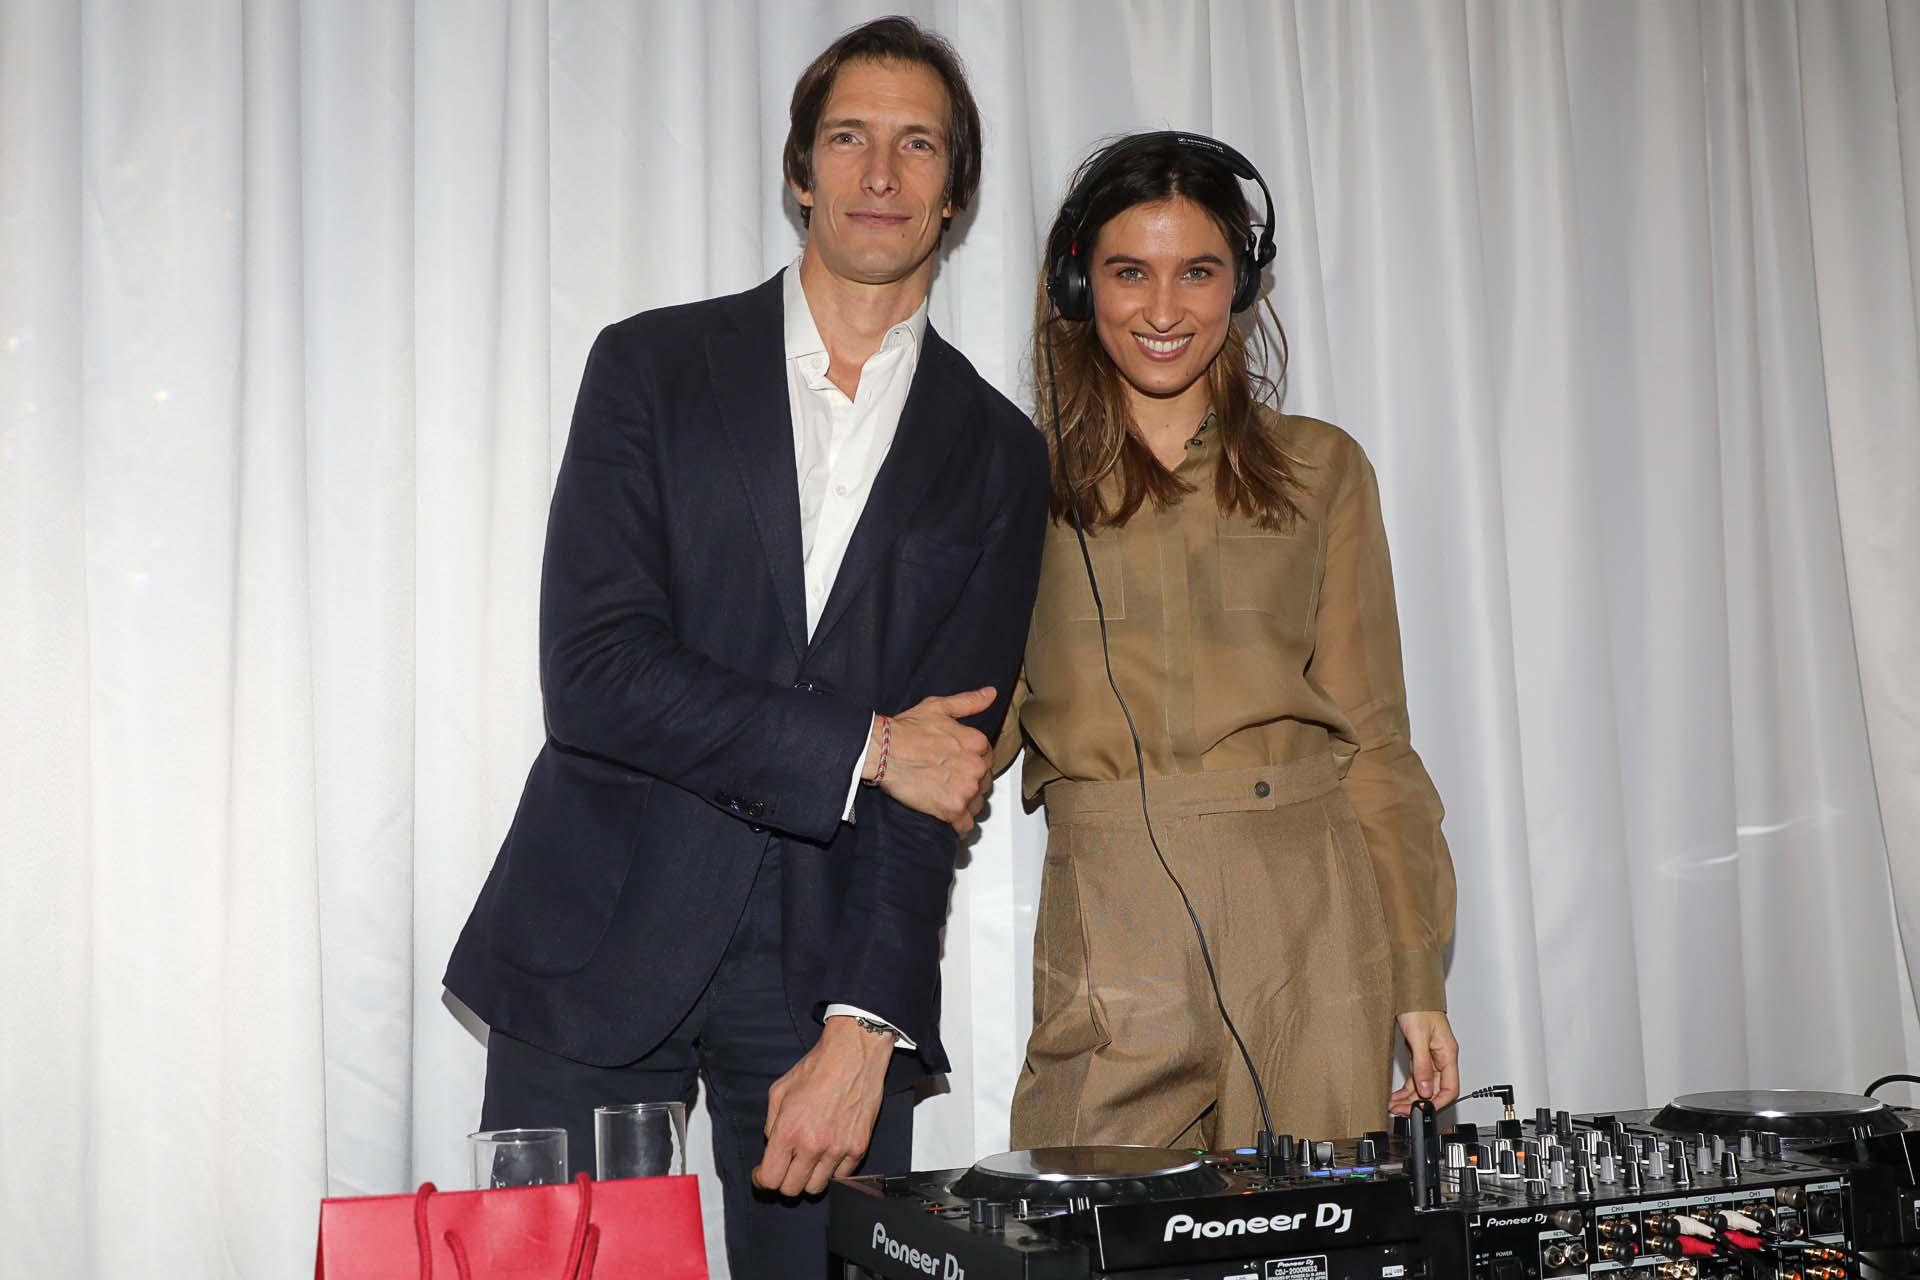 Iván De Pineda y Cintia Garrido /// Fotos: Christian Bochichio